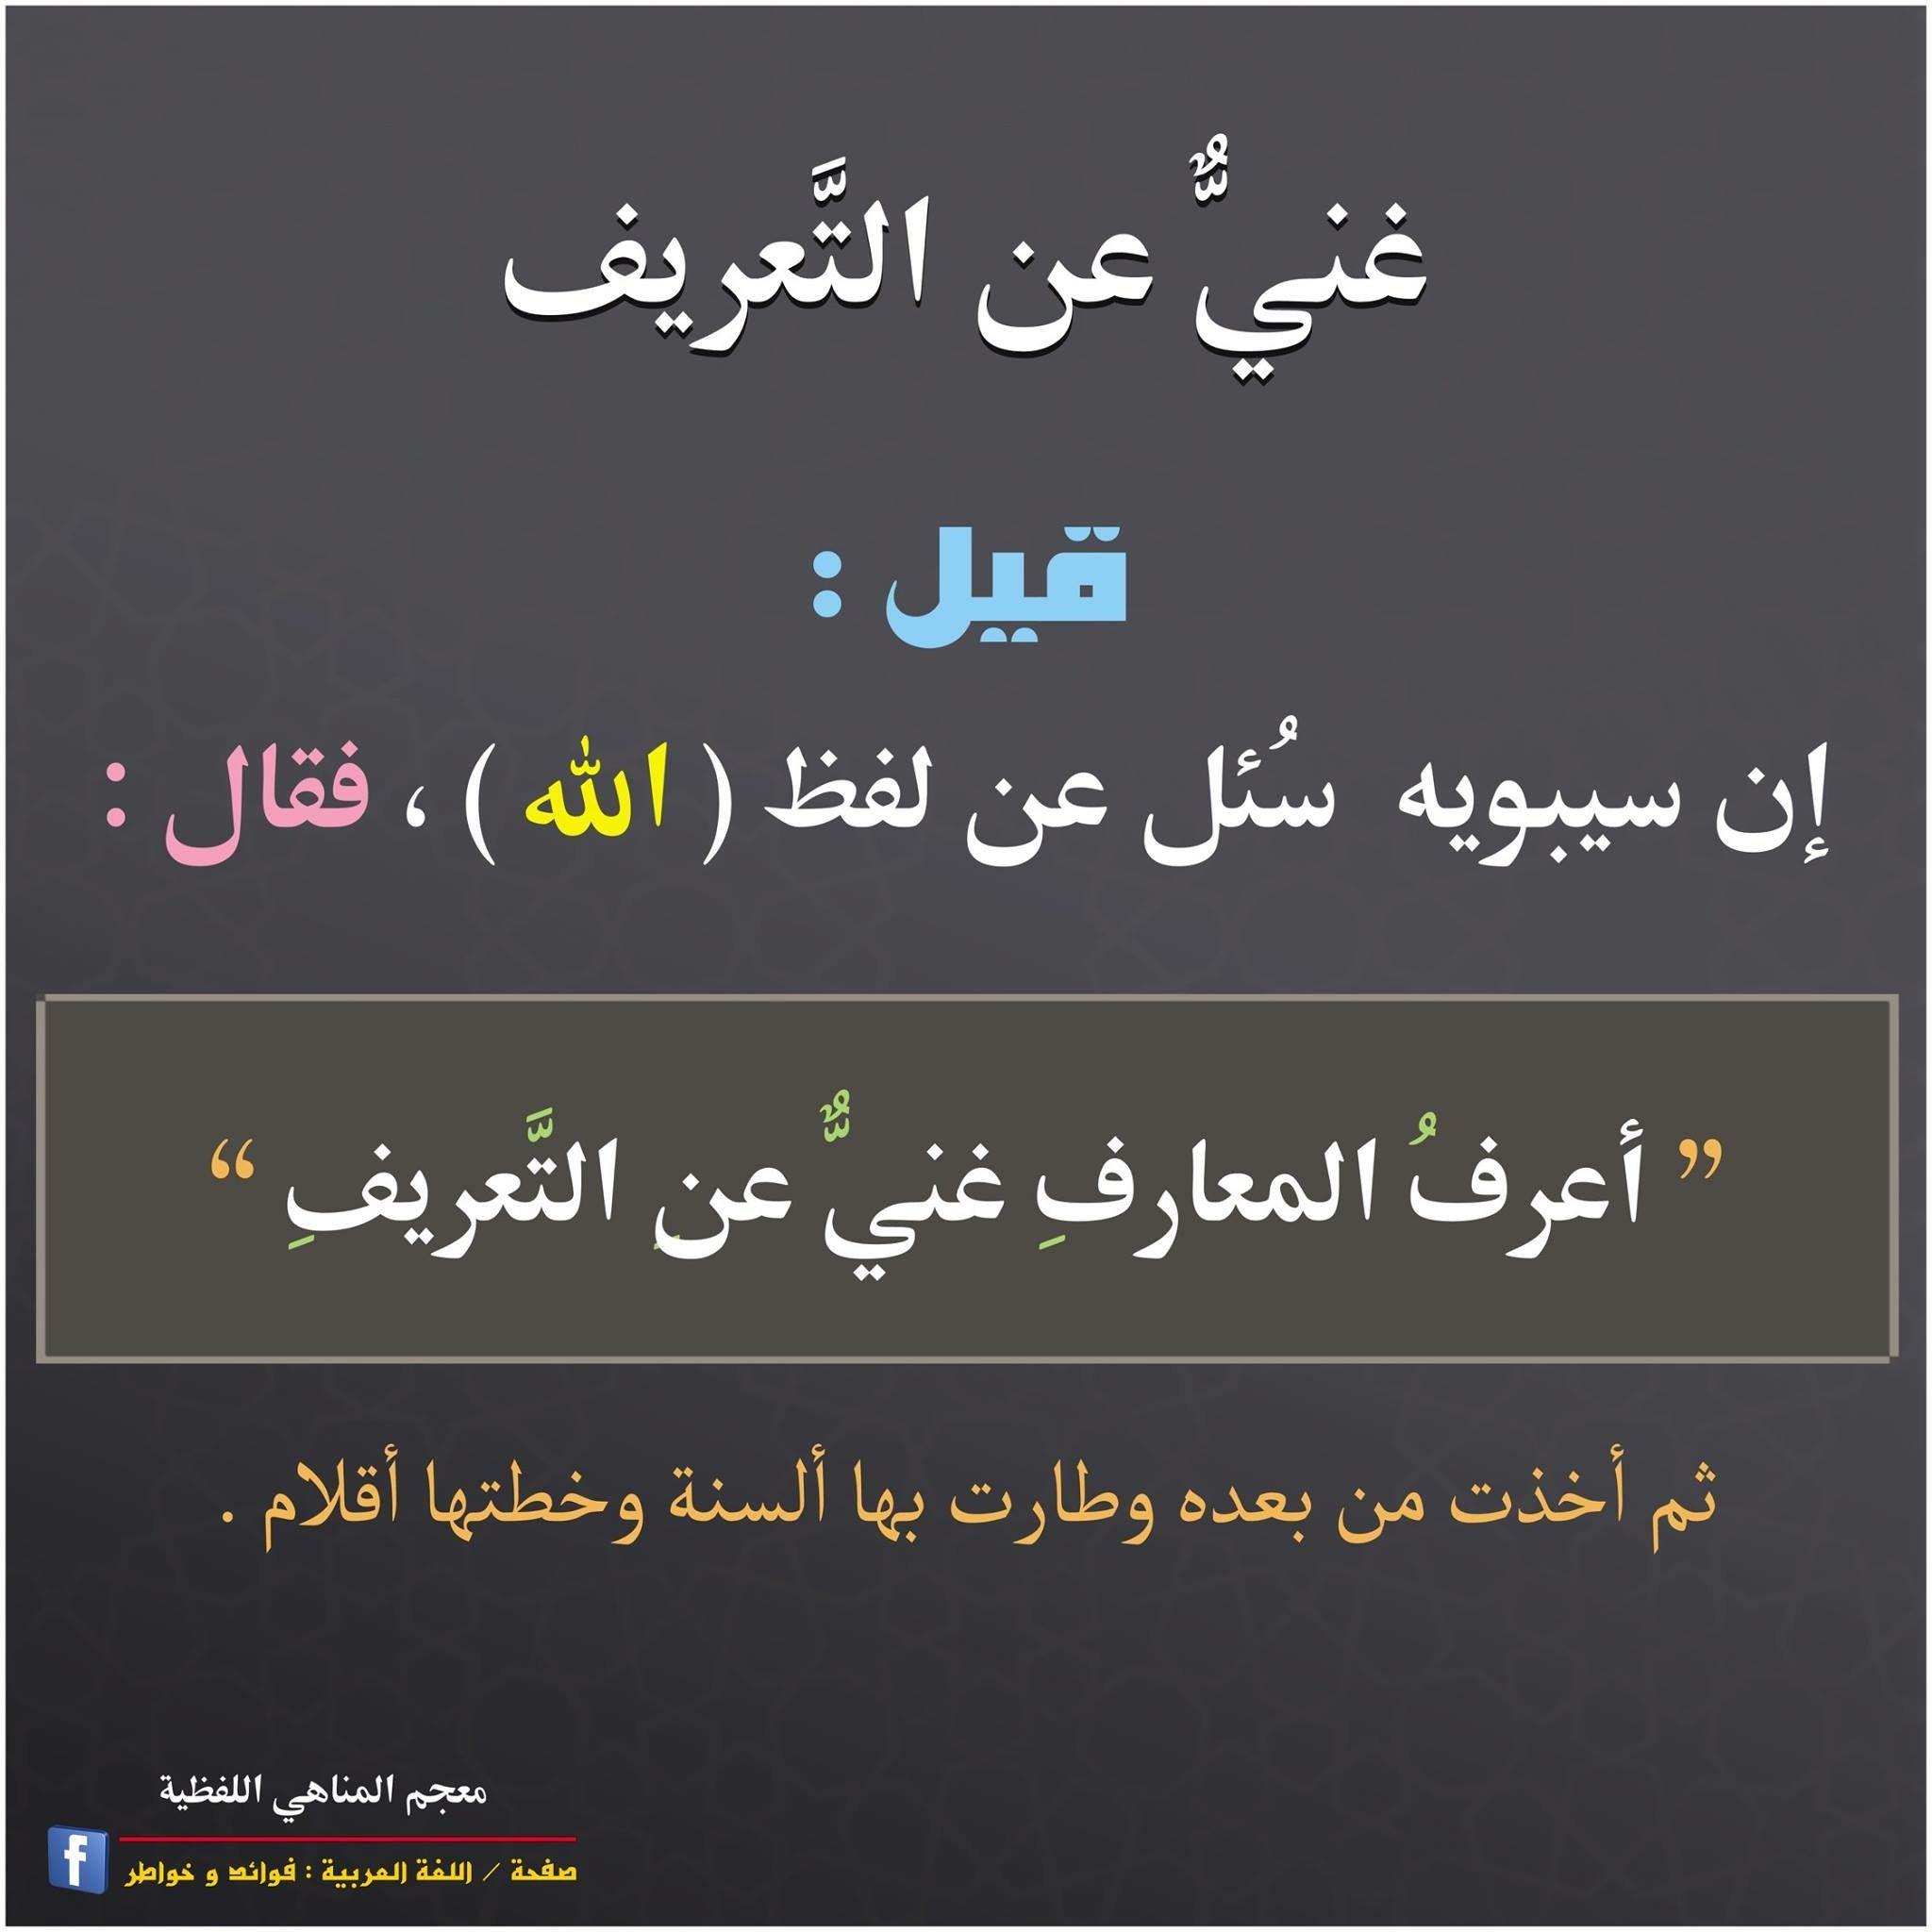 Pin By Abdullah Alharbi On منوعة عربية Learn Arabic Language Beautiful Arabic Words Arabic Words